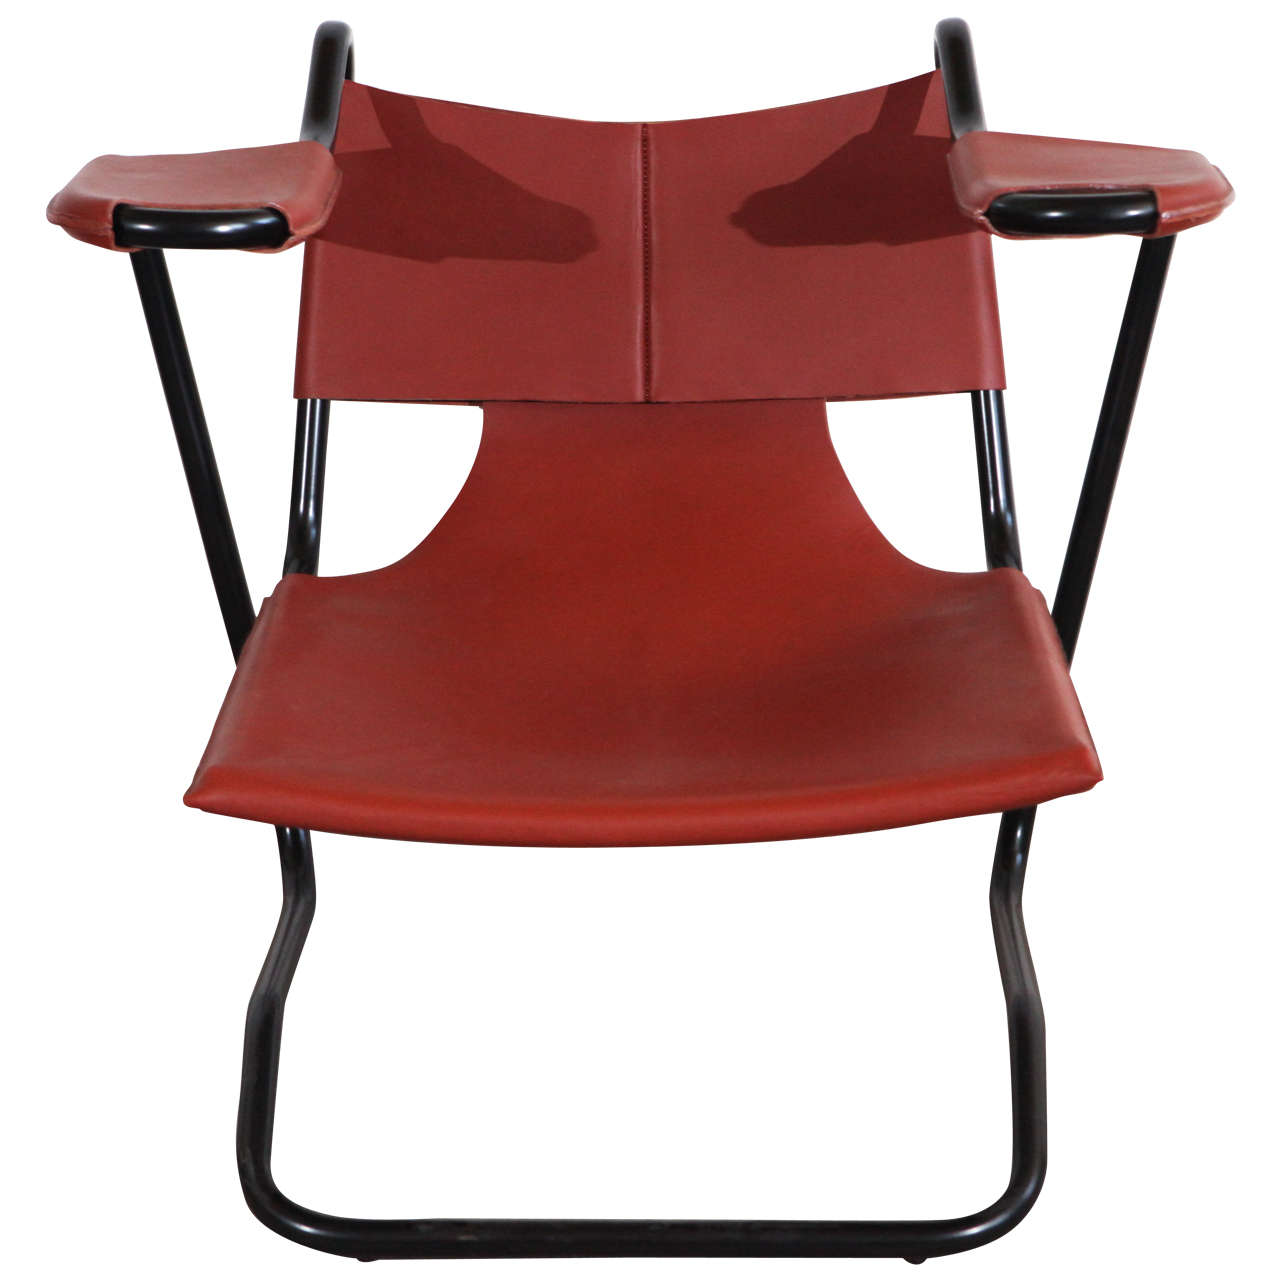 Dan Johnson Sling Chair